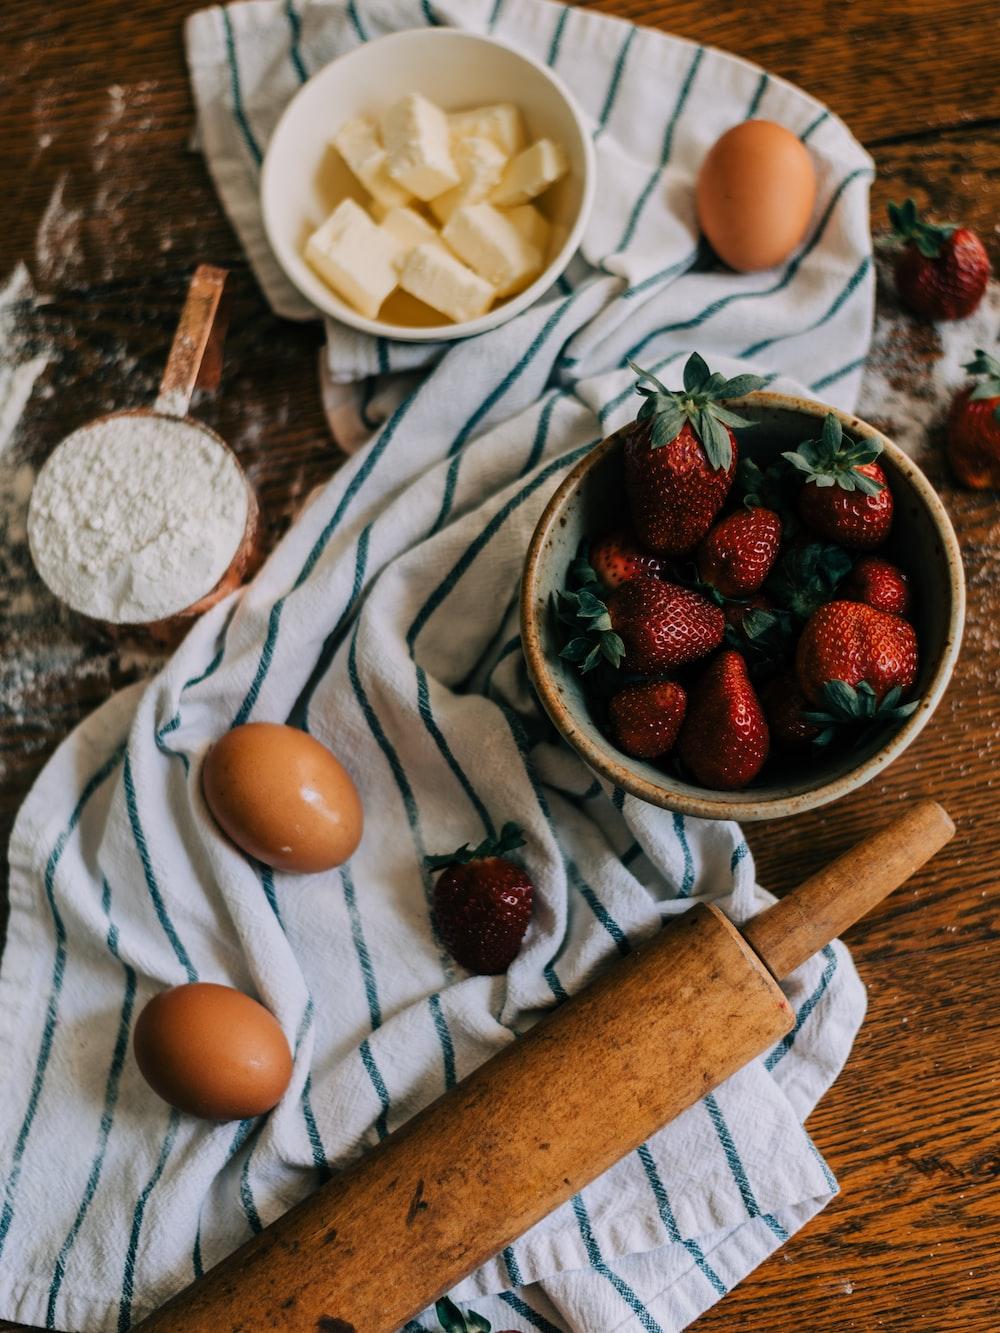 strawberries and blueberries on white ceramic bowl